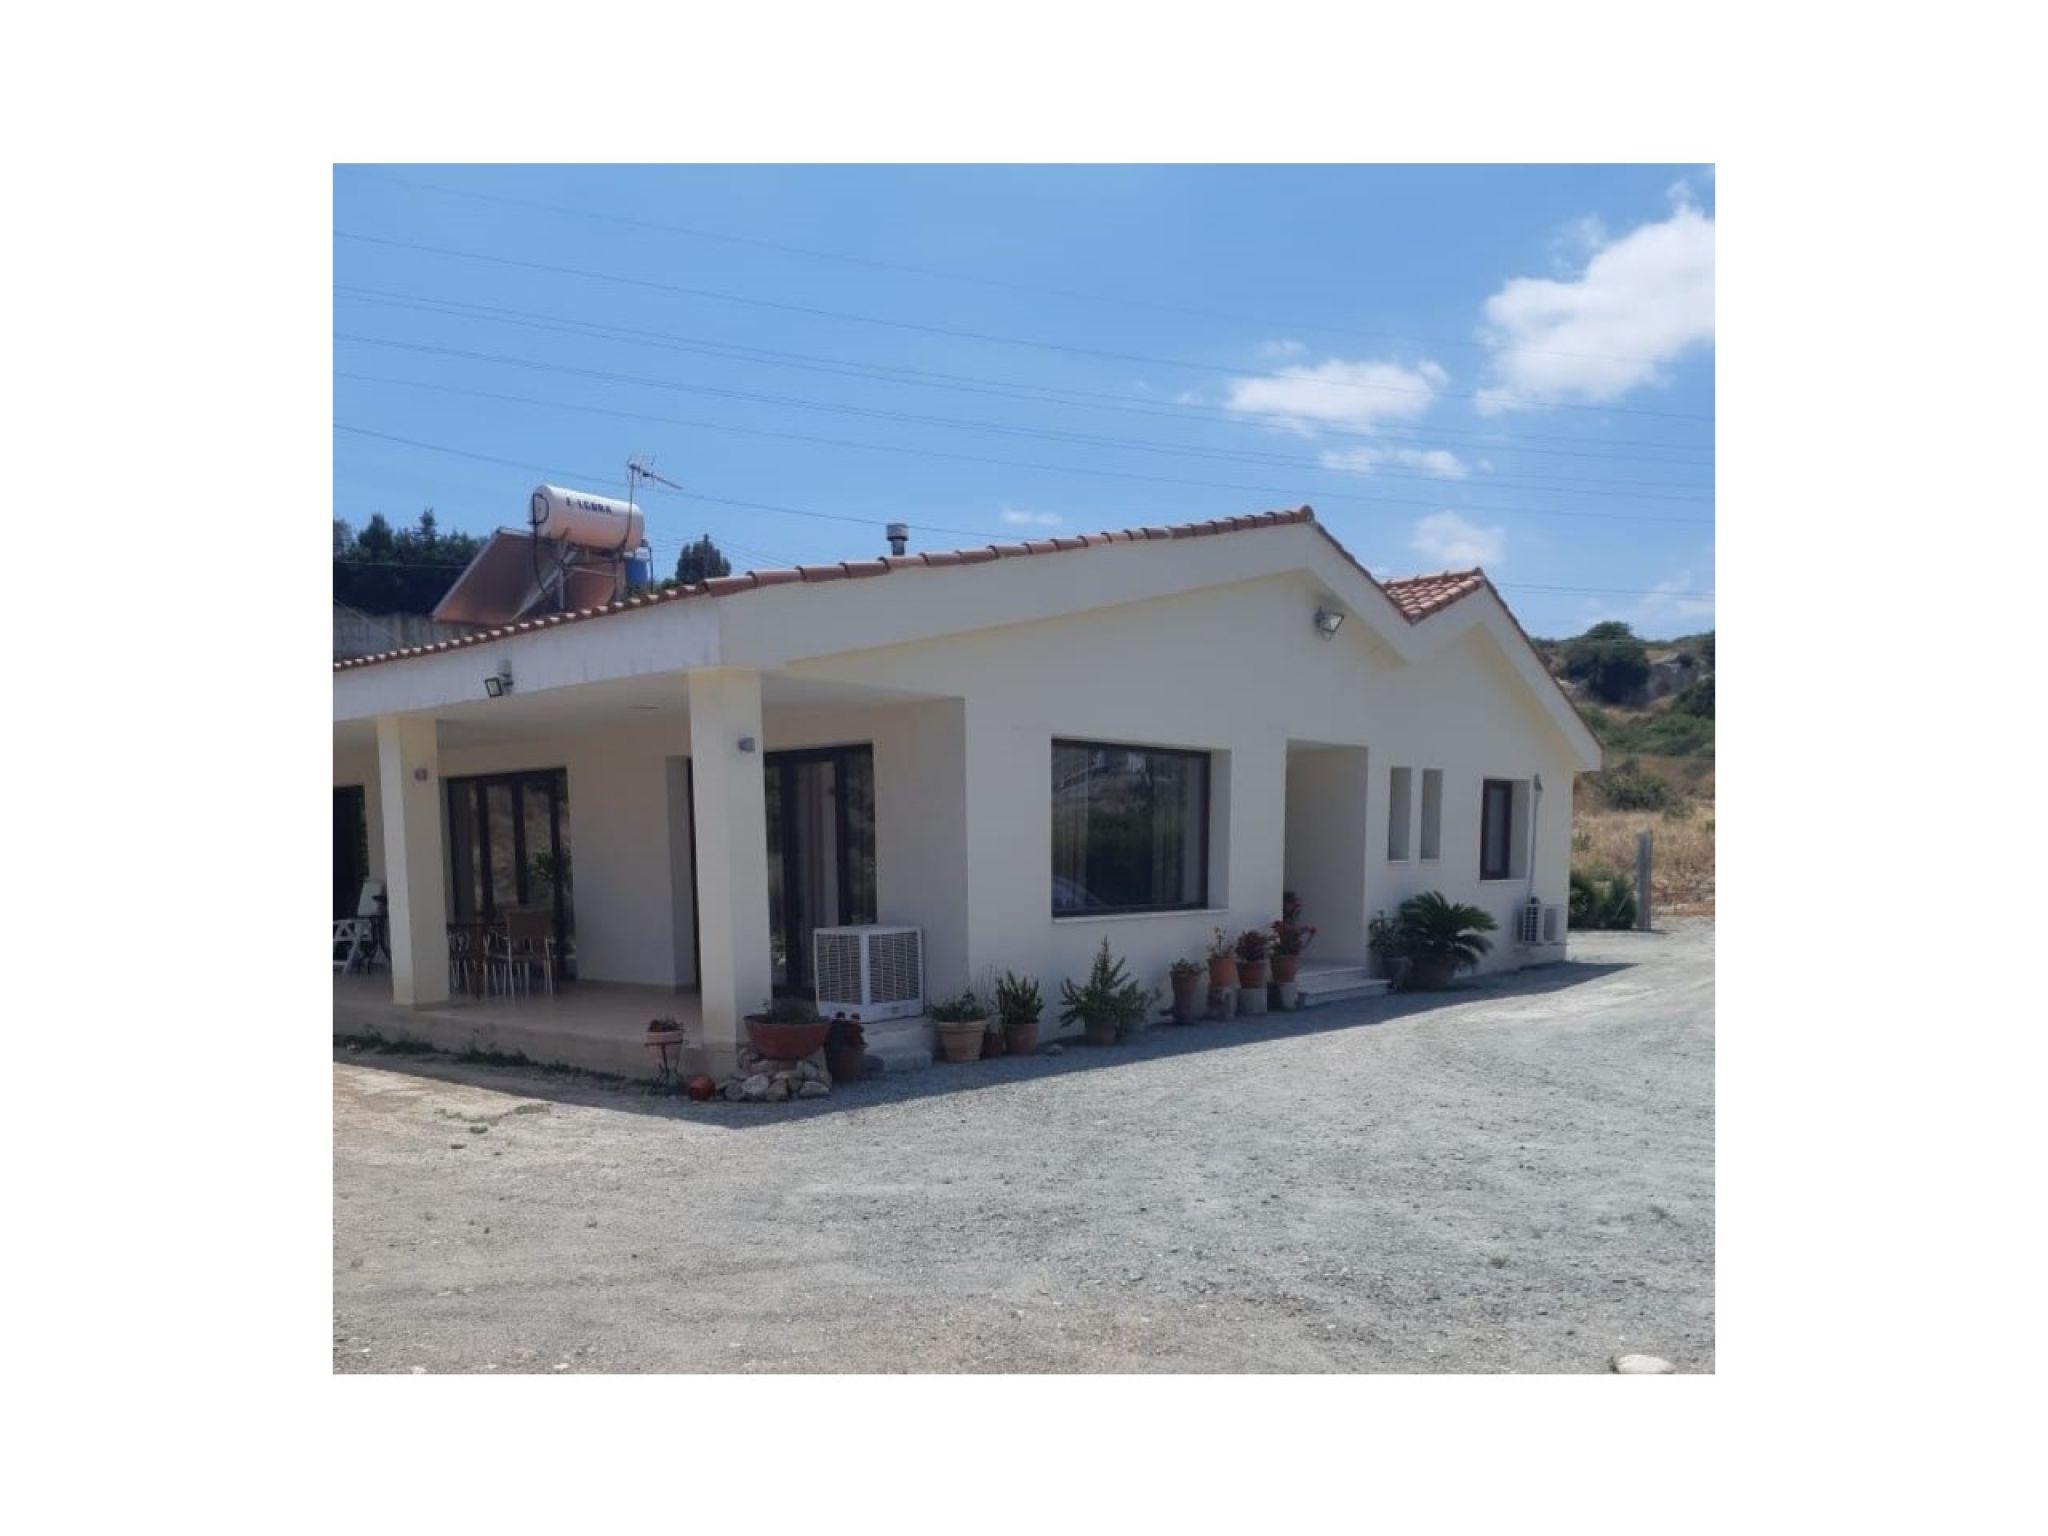 4 bedroom Bungalow in Pyrgos on 1175m2 of land  4 Bedrooms 2.....